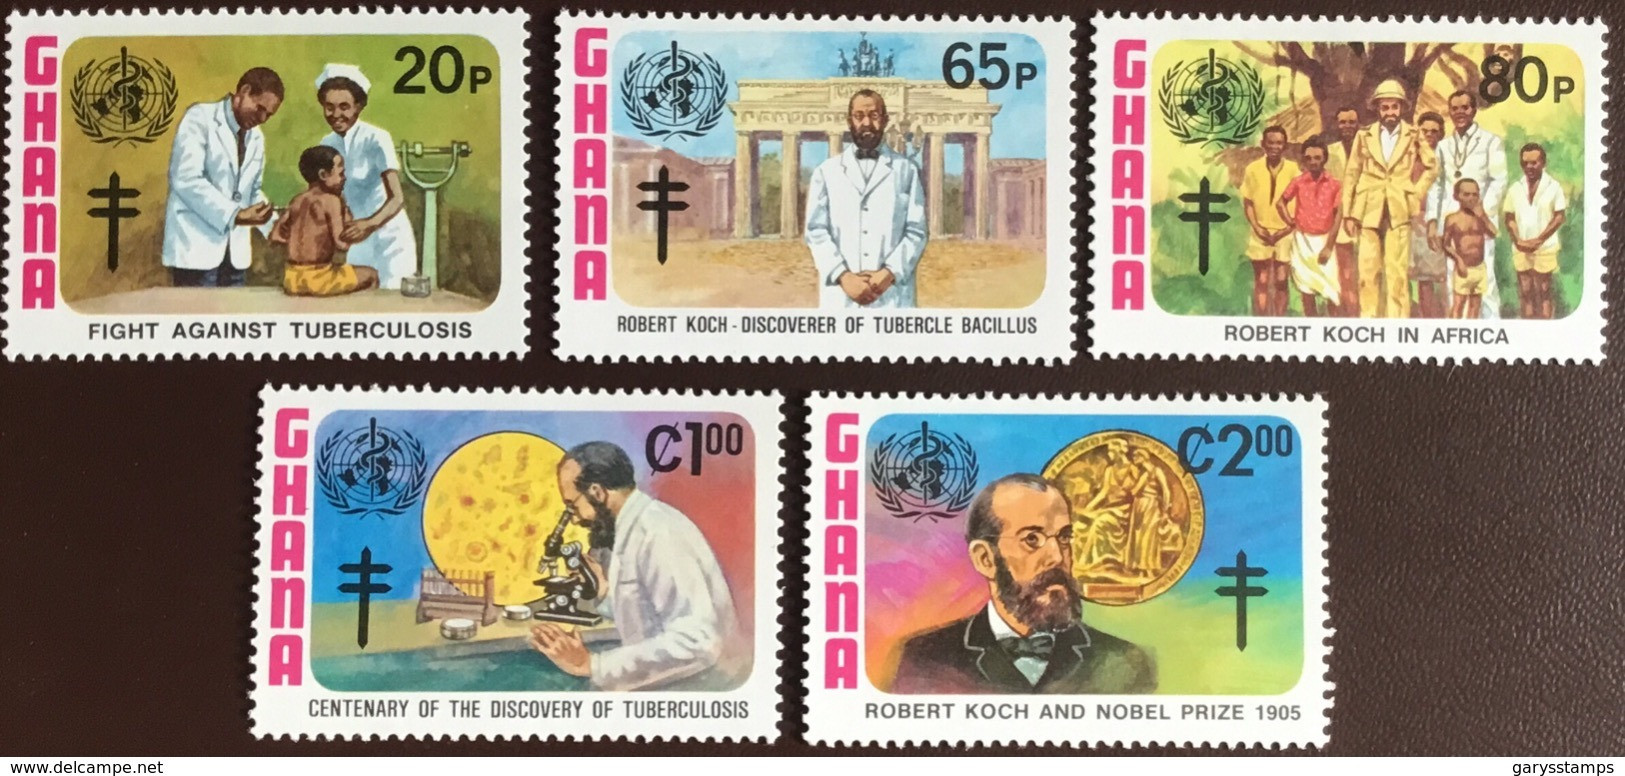 Ghana 1982 Koch TB Discovery MNH - Ghana (1957-...)